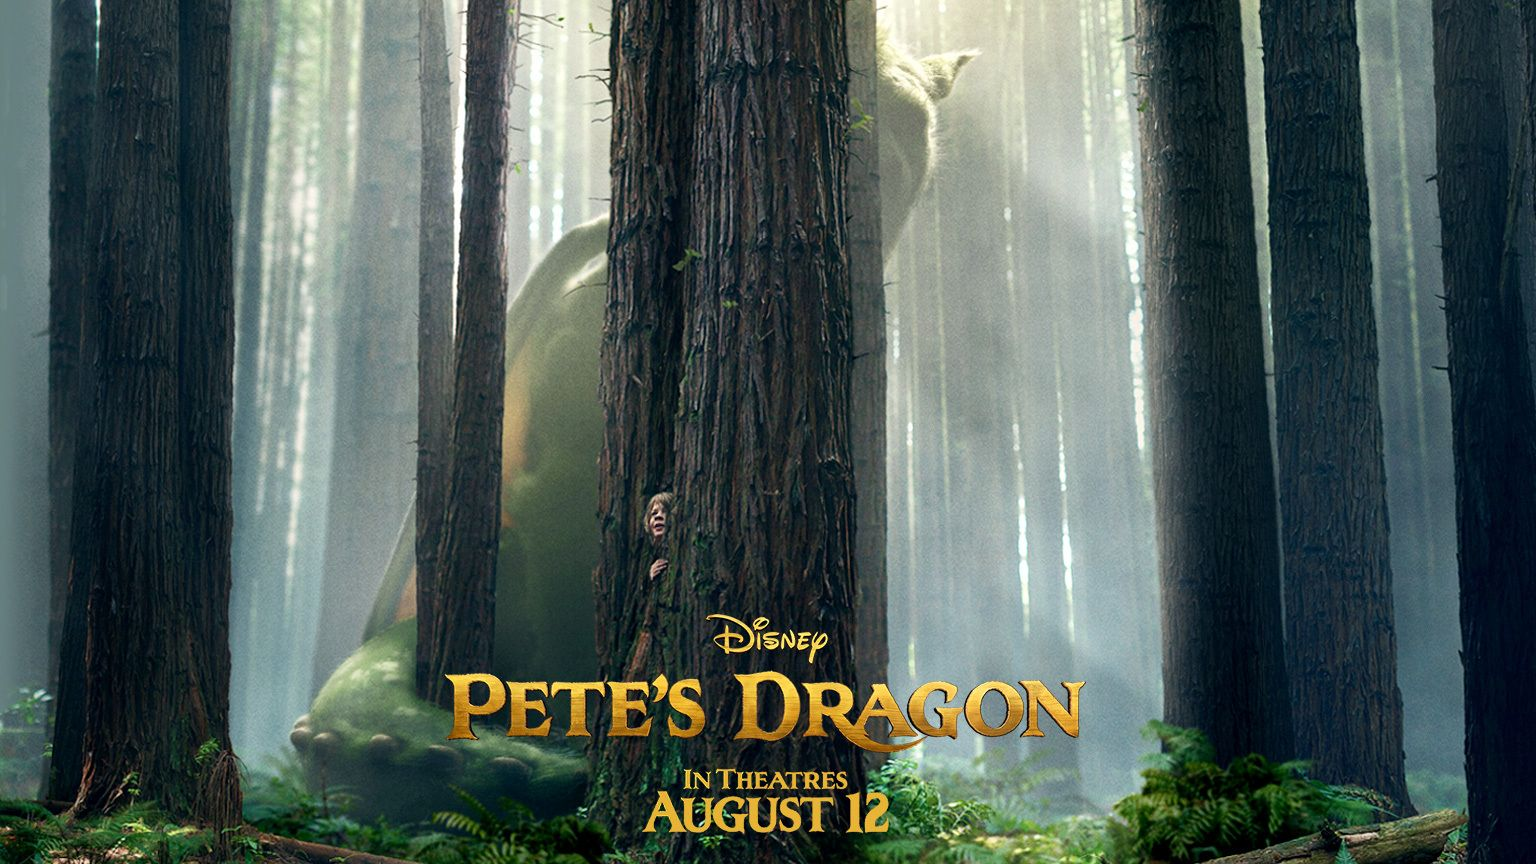 Pete's Dragon 2016 Movie Poster | Pete's Dragon - Motion Poster ...